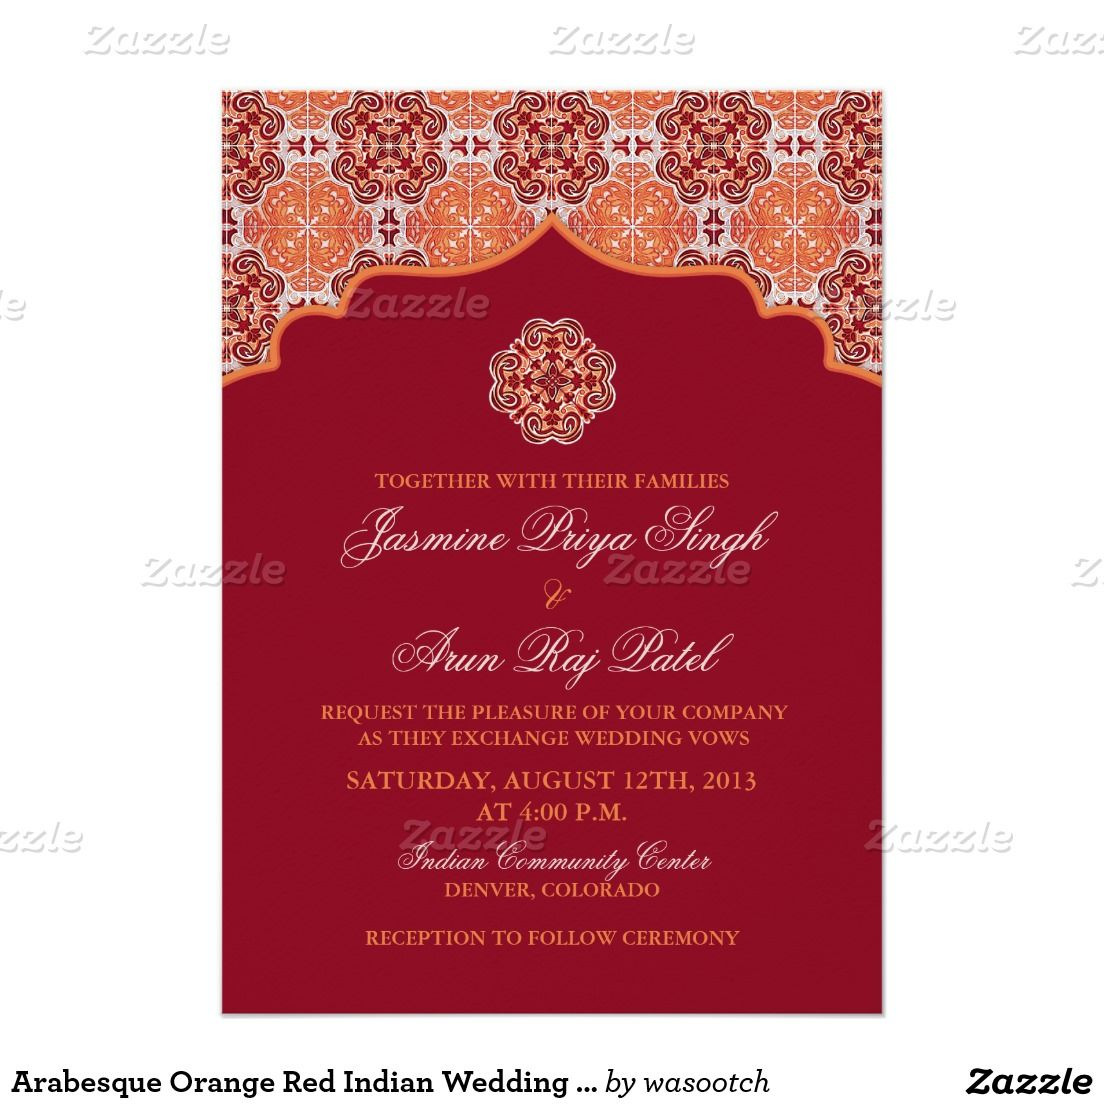 Arabesque Orange Red Indian Wedding Invitation | Katy + Brad ...